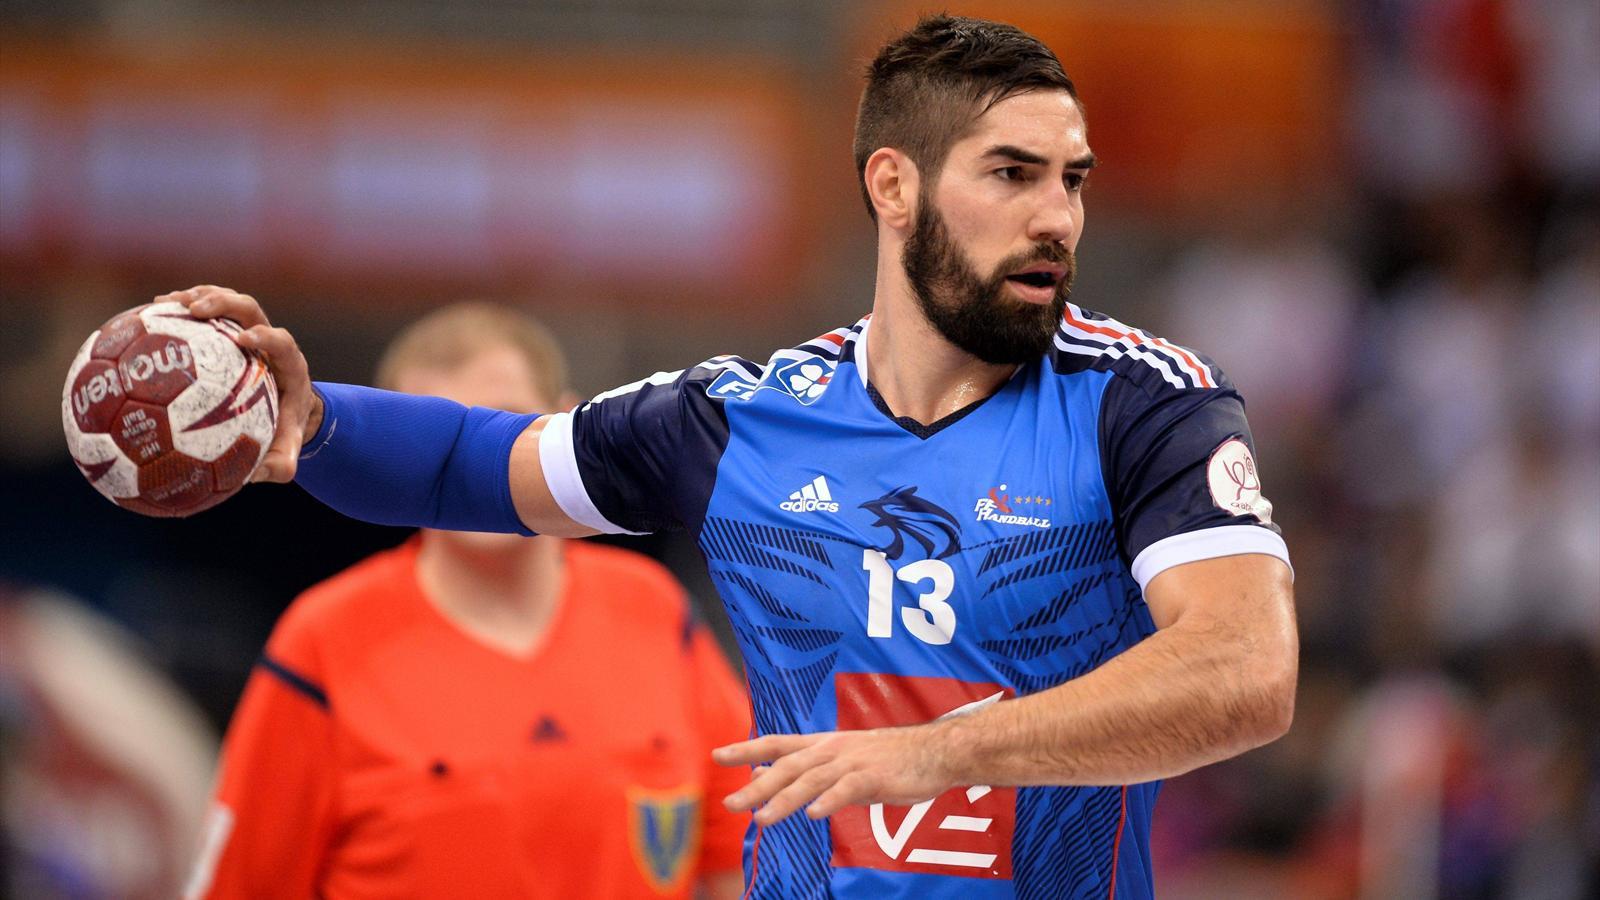 Mondial 2015 equipe de france nikola karabatic devrait - Diffusion coupe du monde de handball 2015 ...